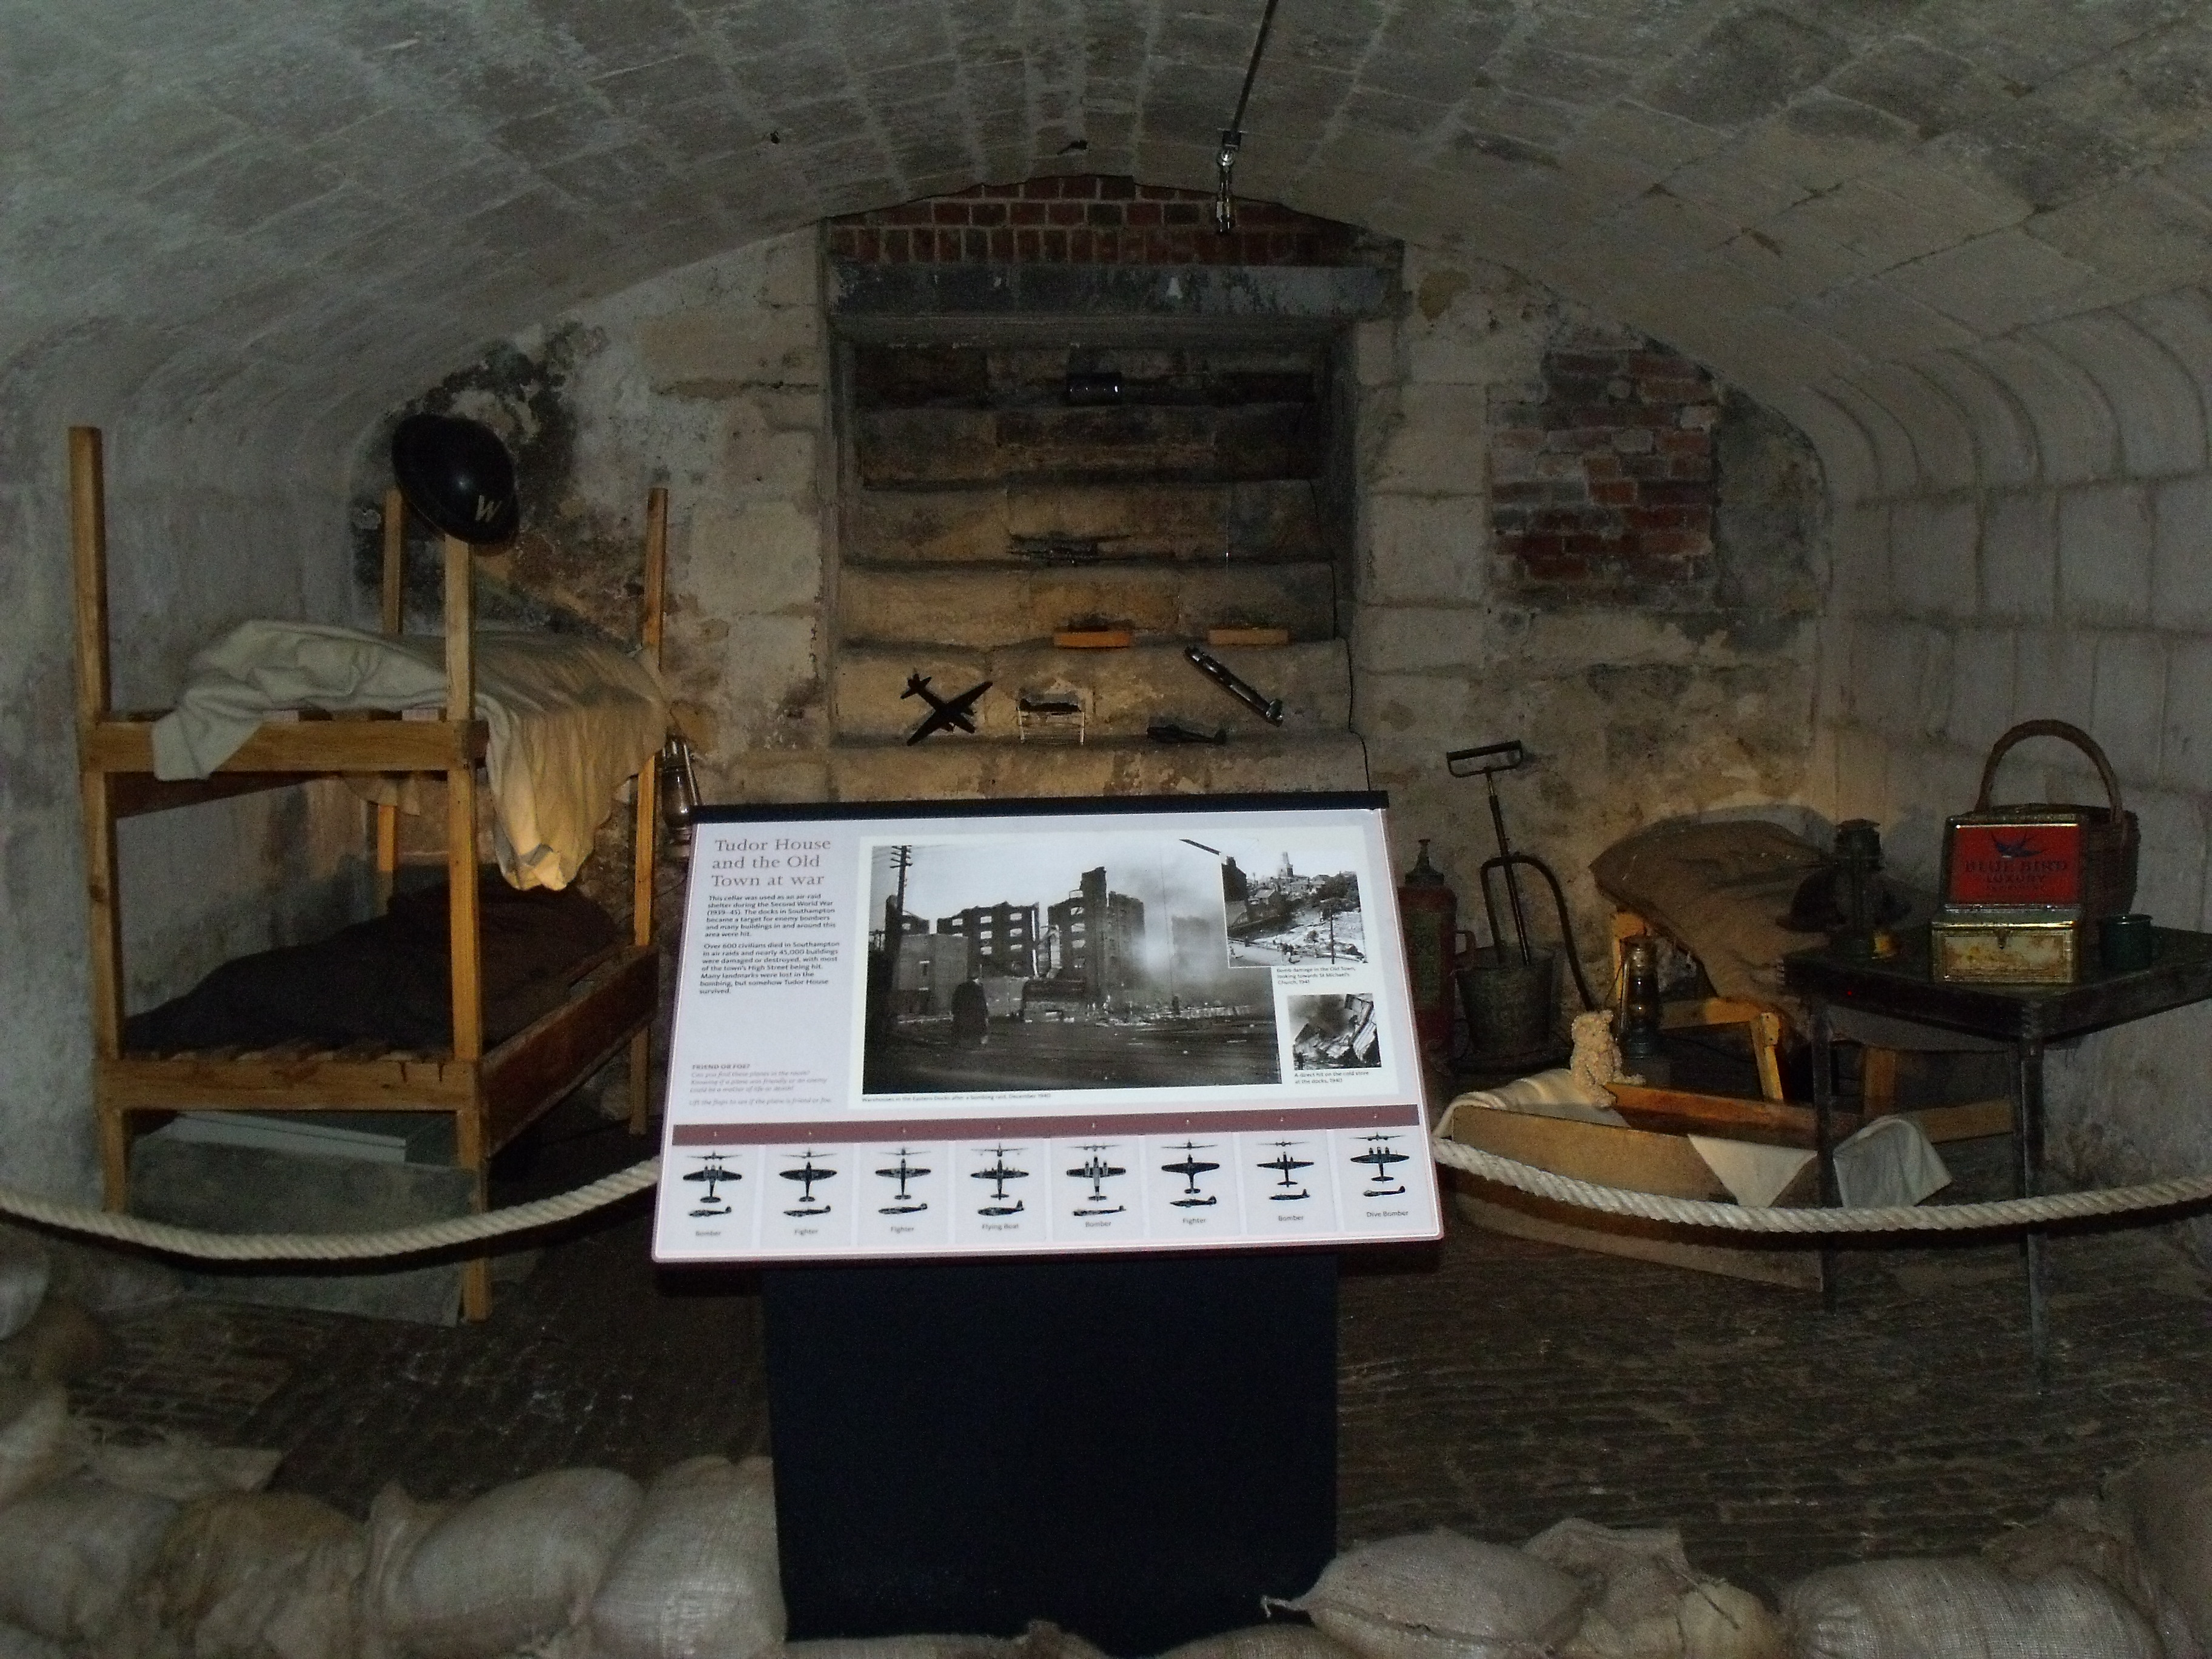 World War Ii Air Raid Shelter Display Tudor House And Garden Southampton Hampshire Come